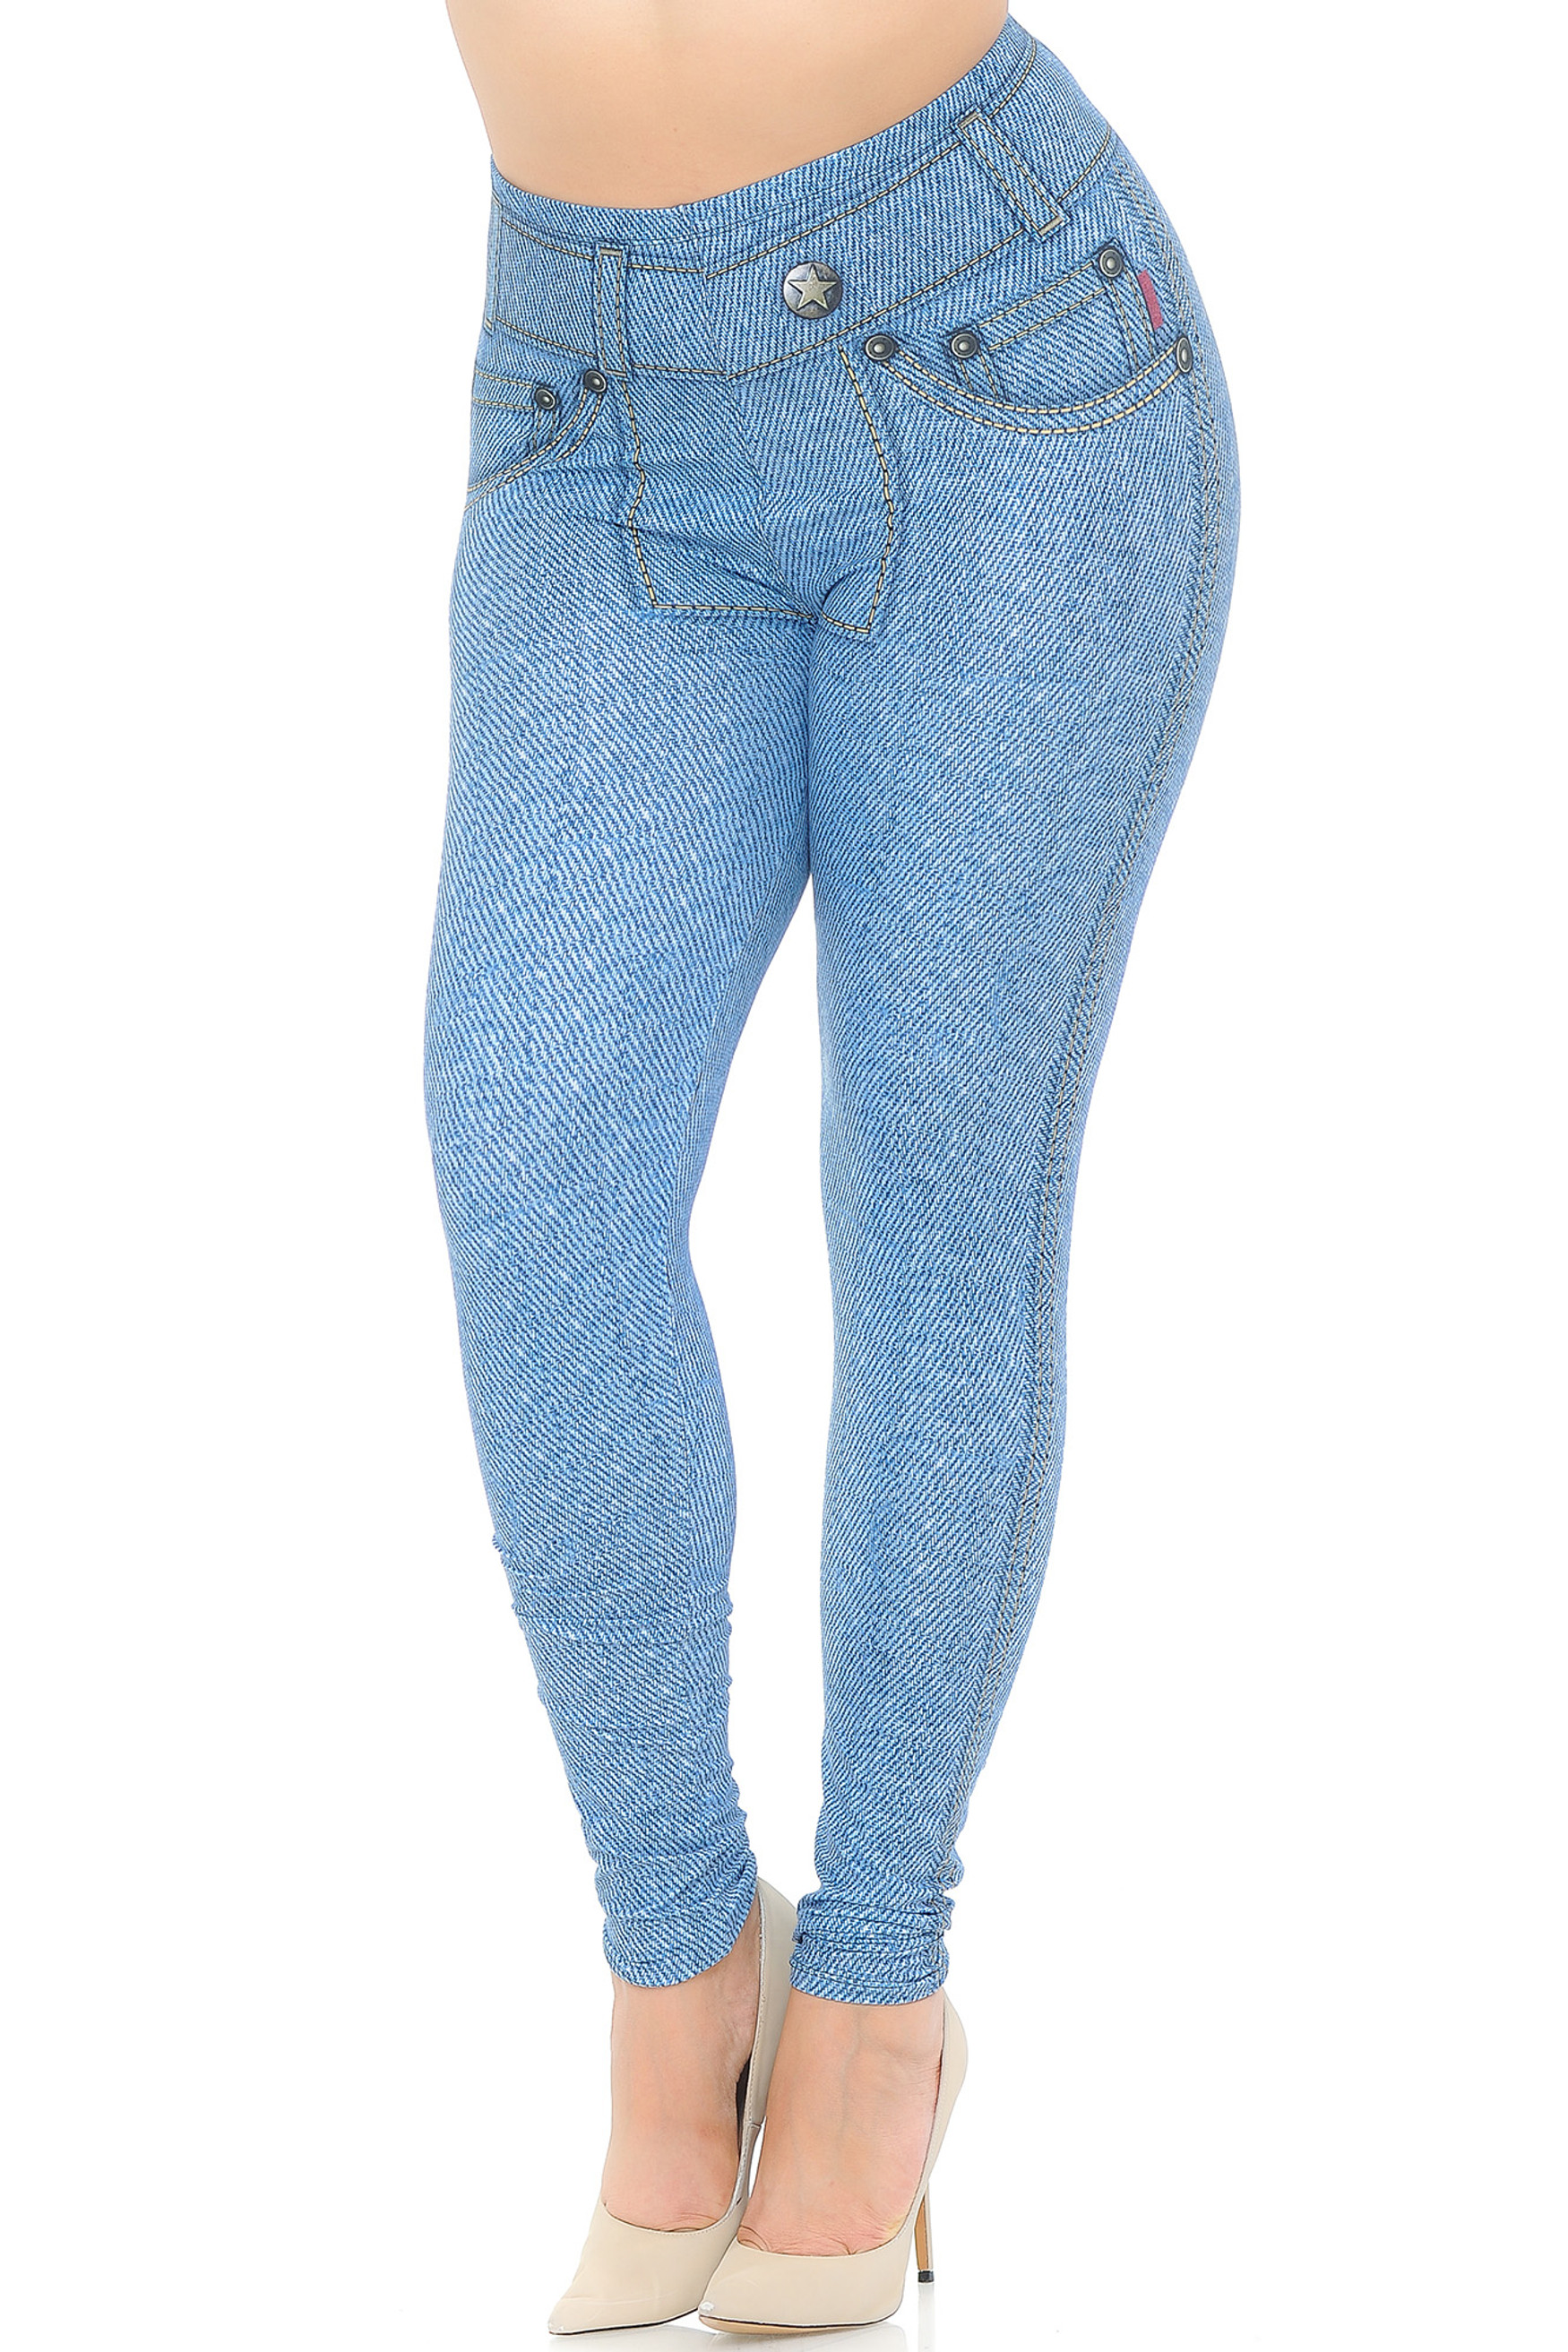 Creamy Soft Beautiful Blue Jean Extra Plus Size Leggings - 3X-5X - USA Fashion™